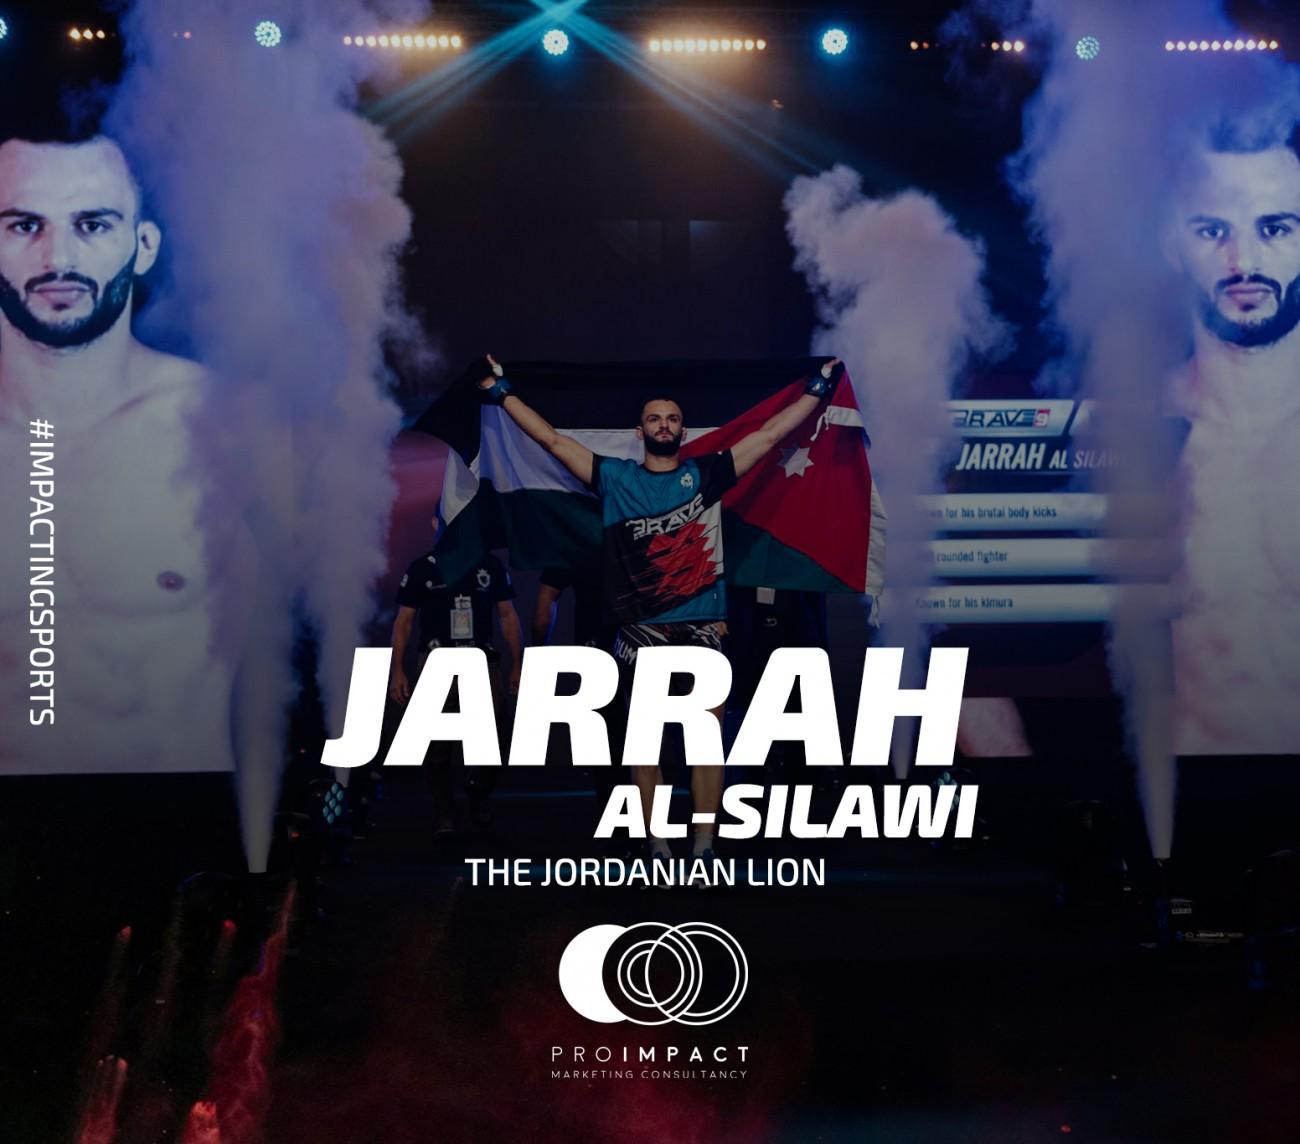 JARRAH3 e1554481933148 - Image gallery